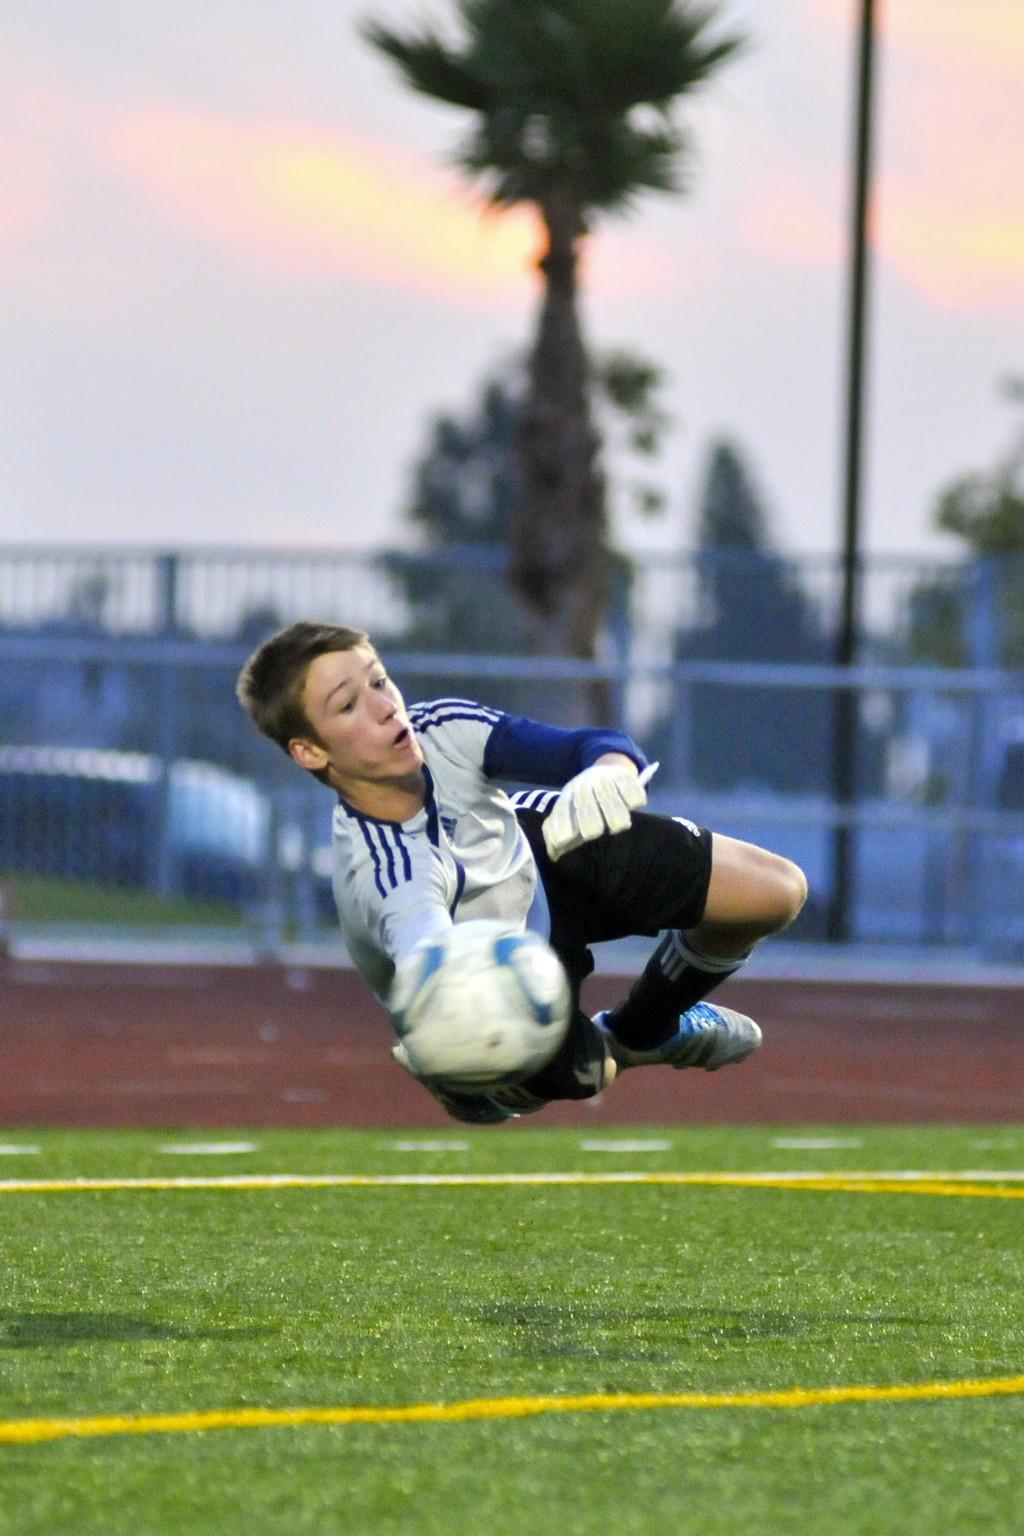 Soccer goalie blocking a shot